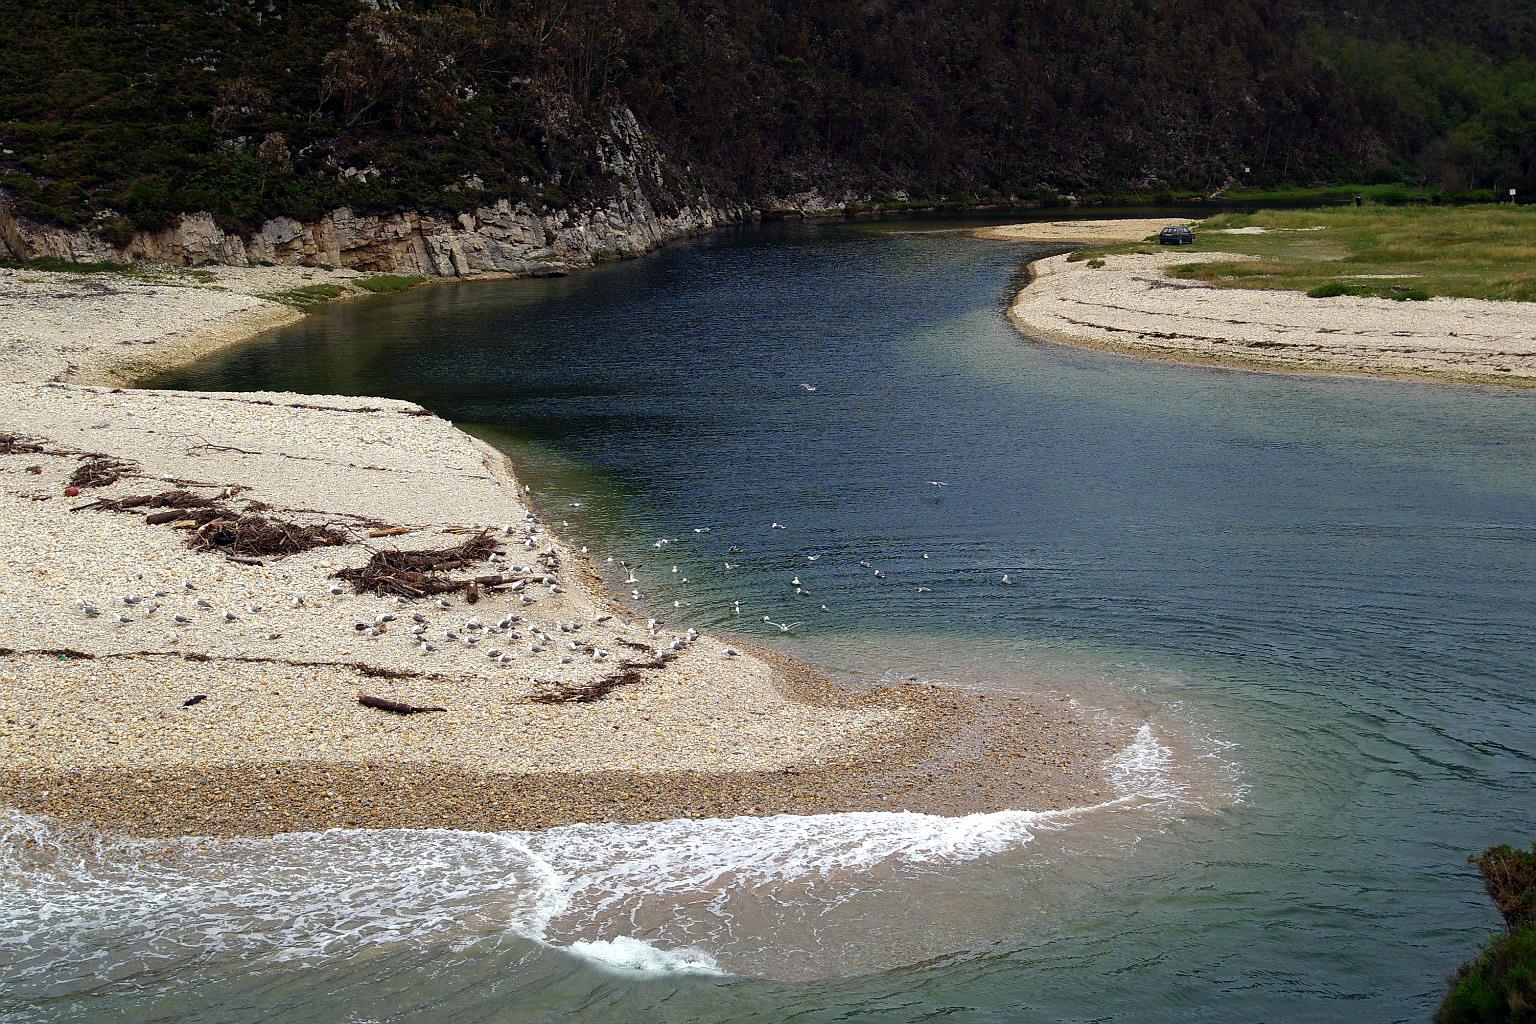 Foto playa San Antolín. Desembocadura Rio Bedón, San Antolin de Bedon, LLanes, Asturias